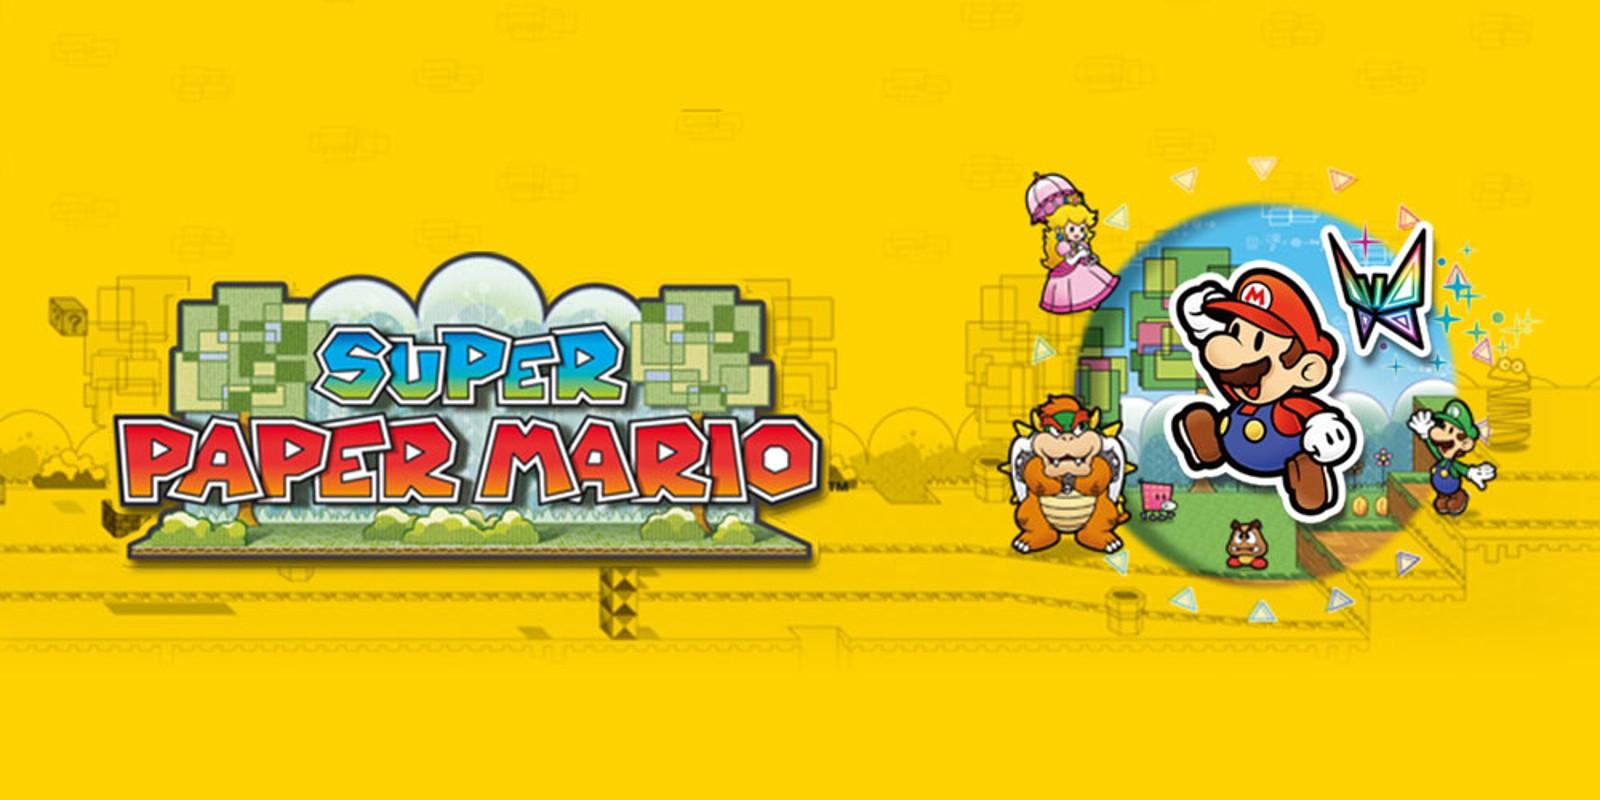 Super Paper Mario | Wii | Games | Nintendo